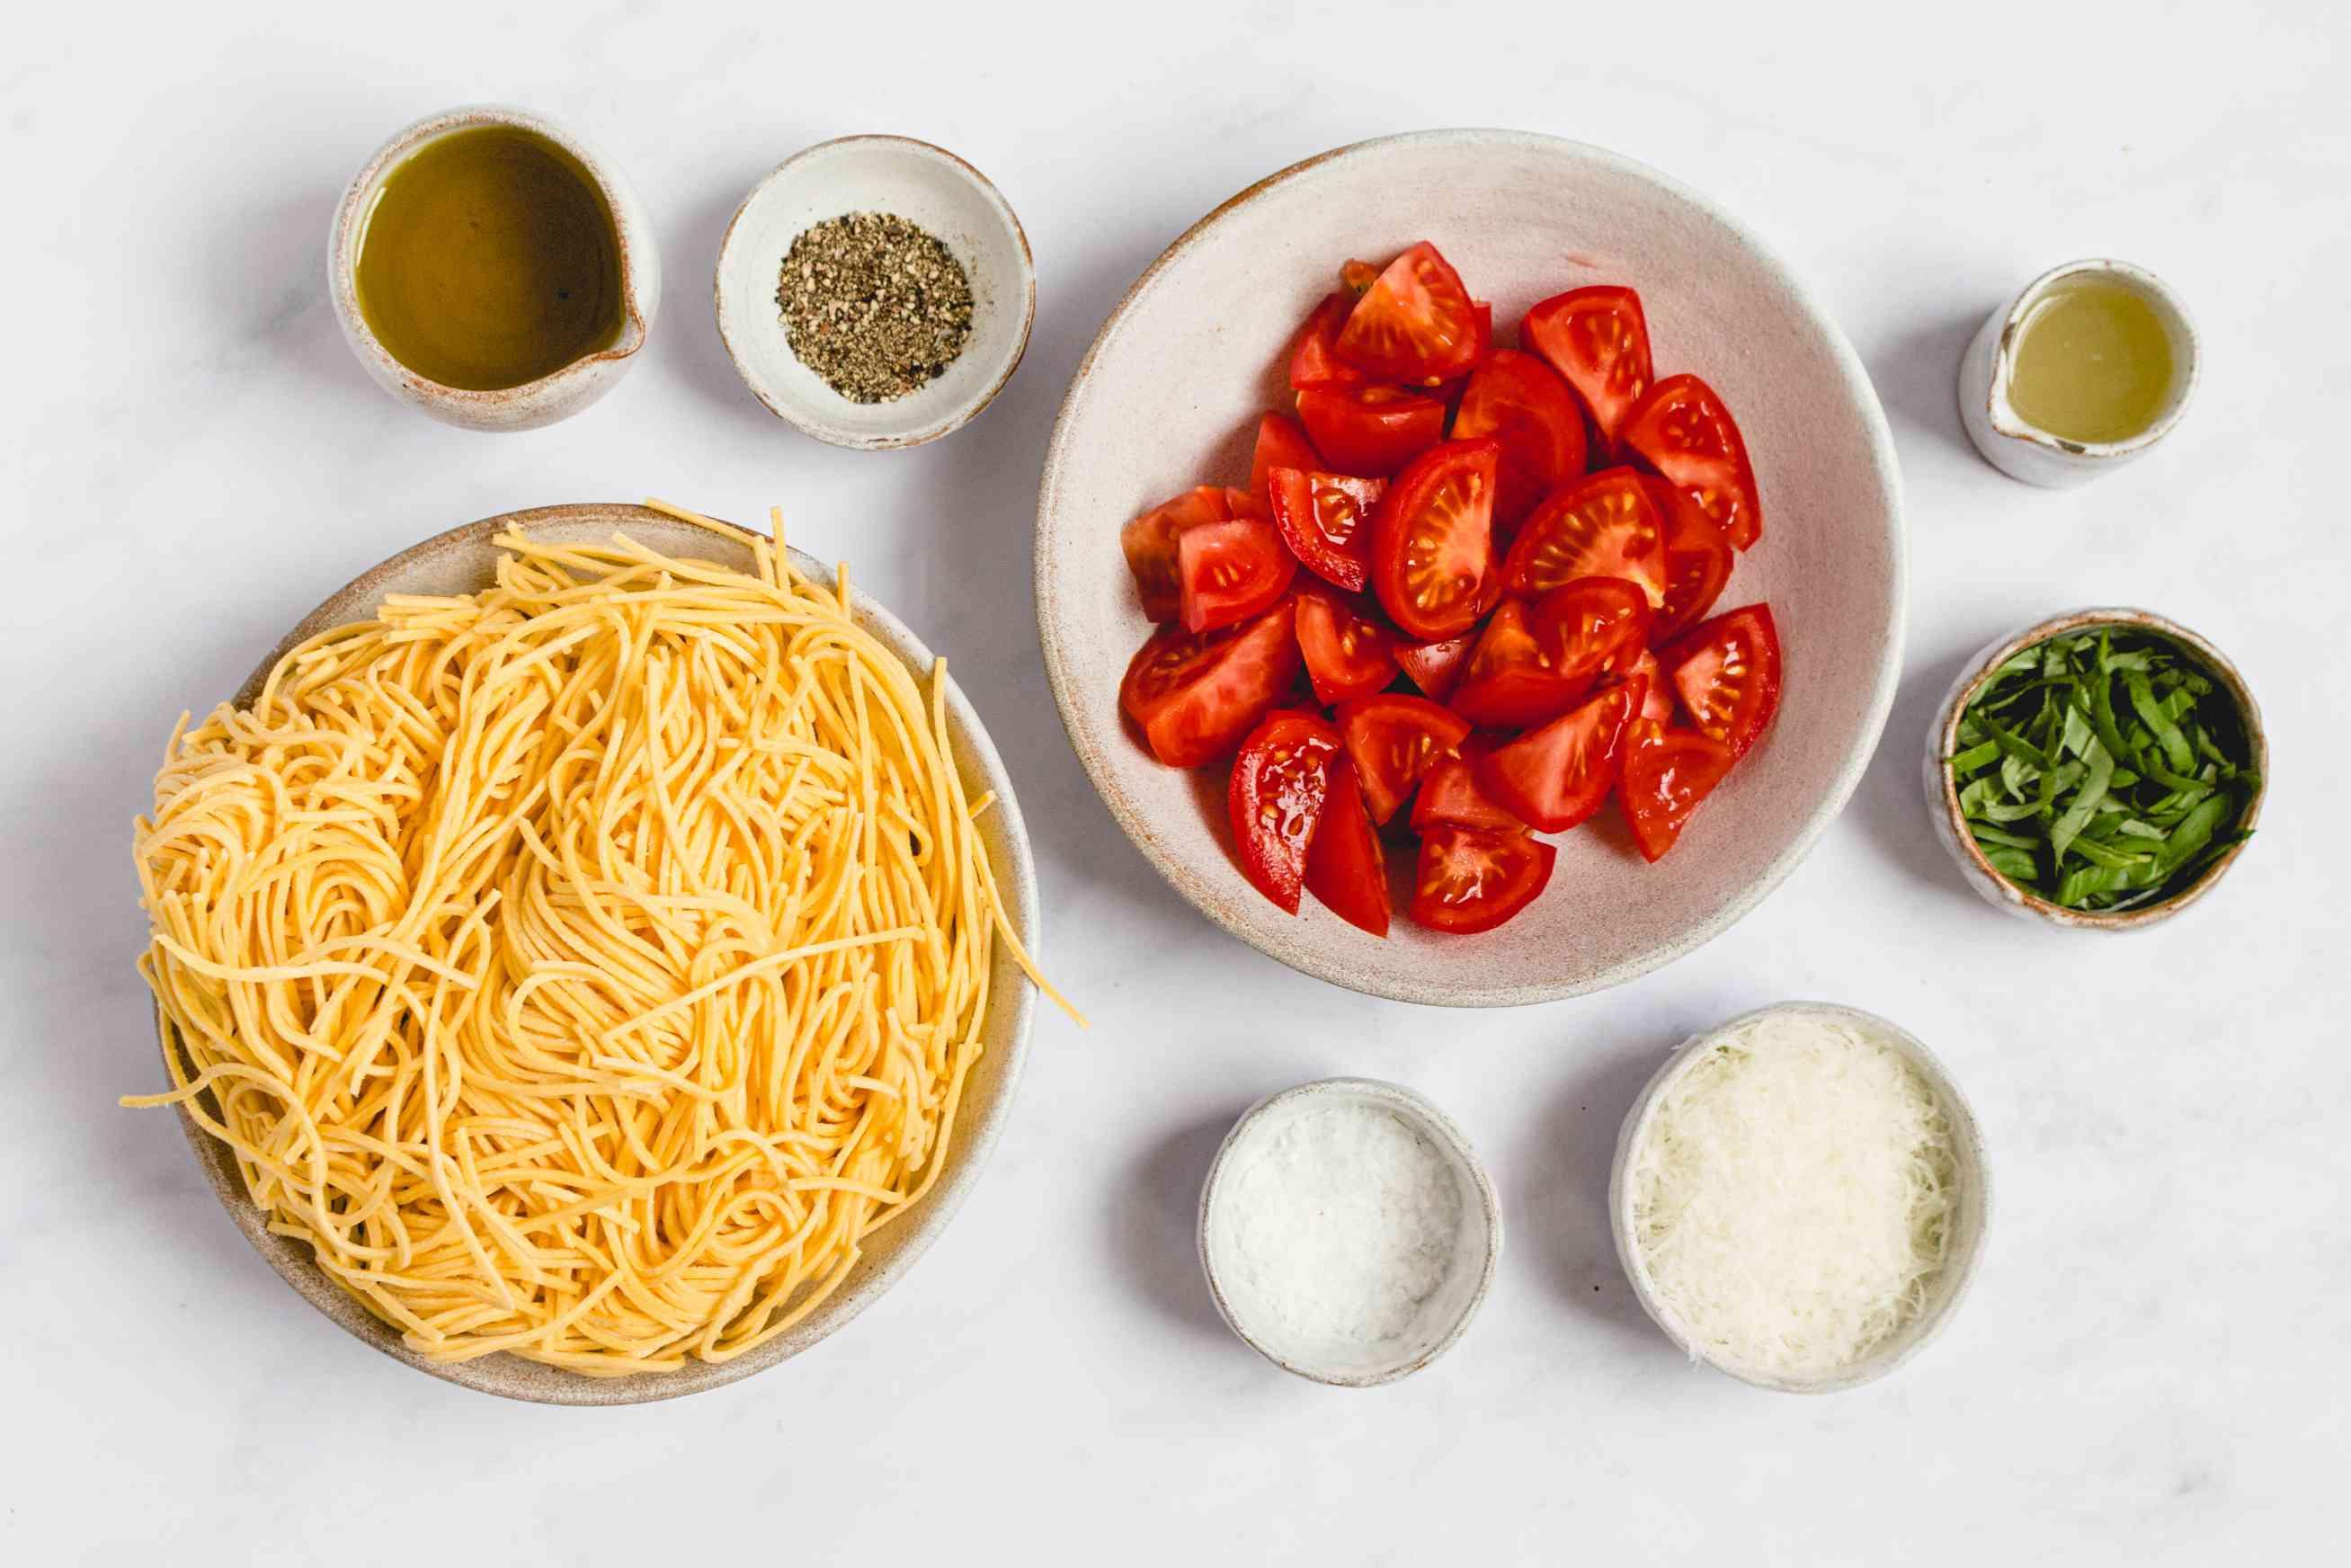 Fresh Tomato Pasta With Basil ingredients